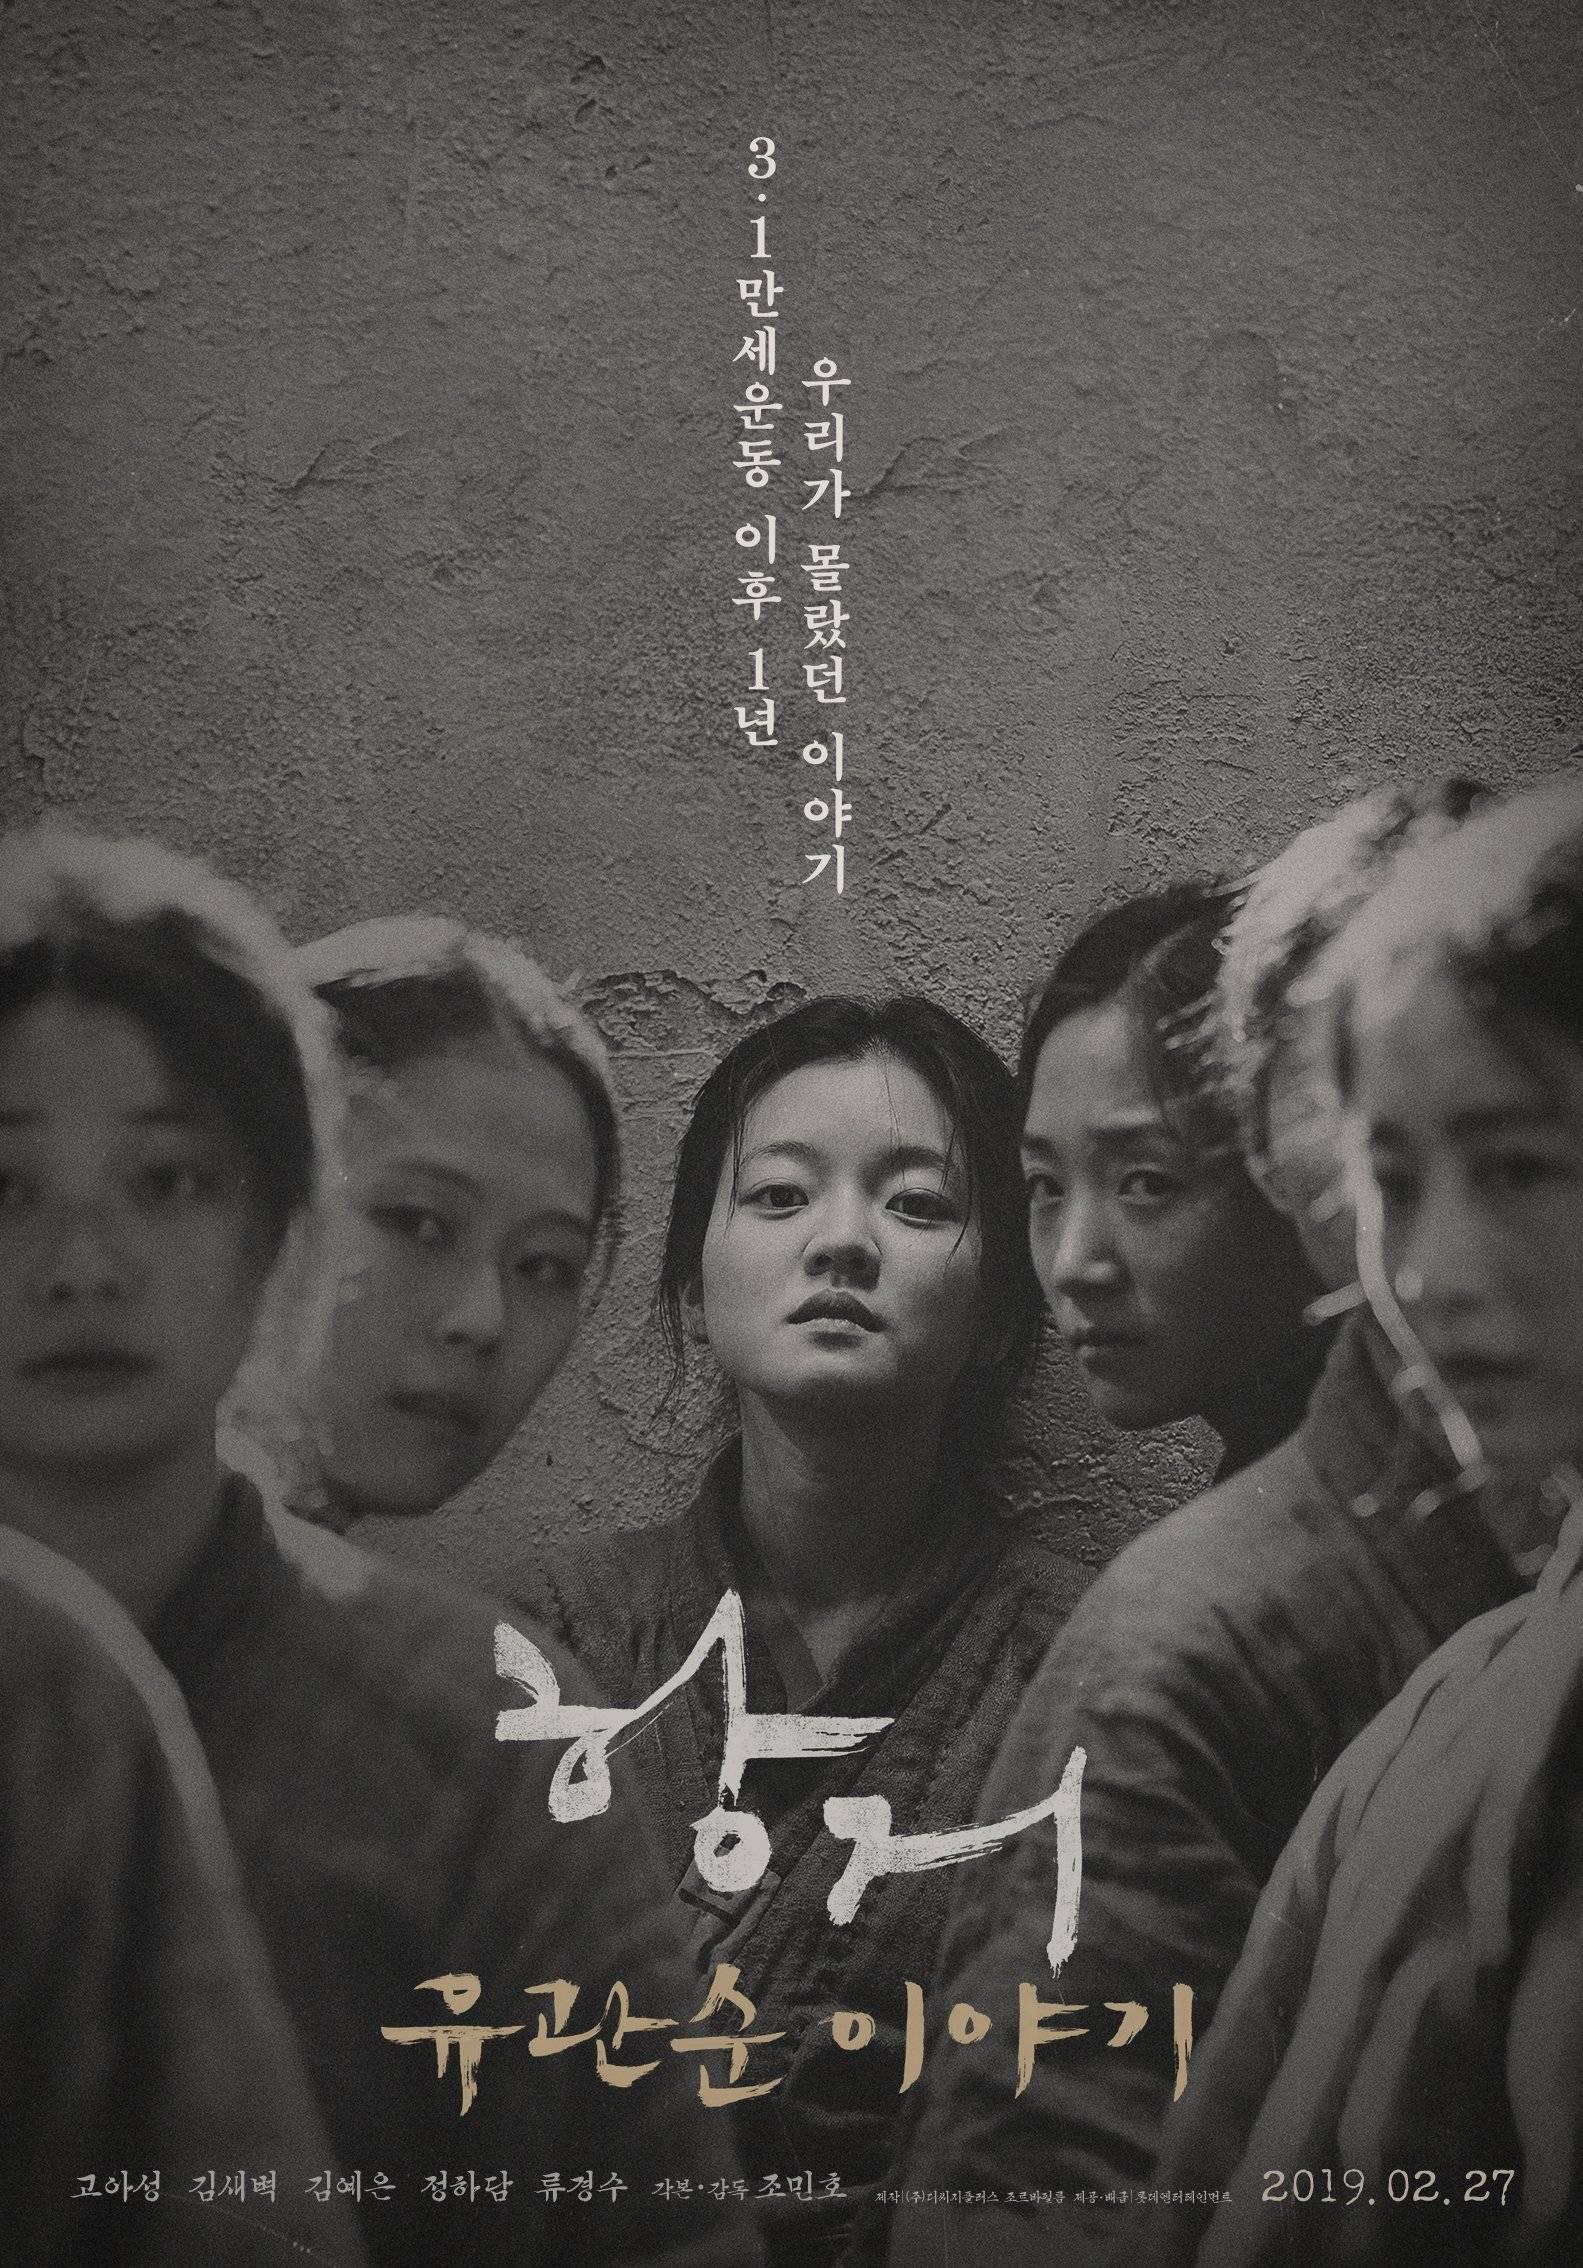 Korean Movies Opening Today 2019/02/27 in Korea @ HanCinema :: The